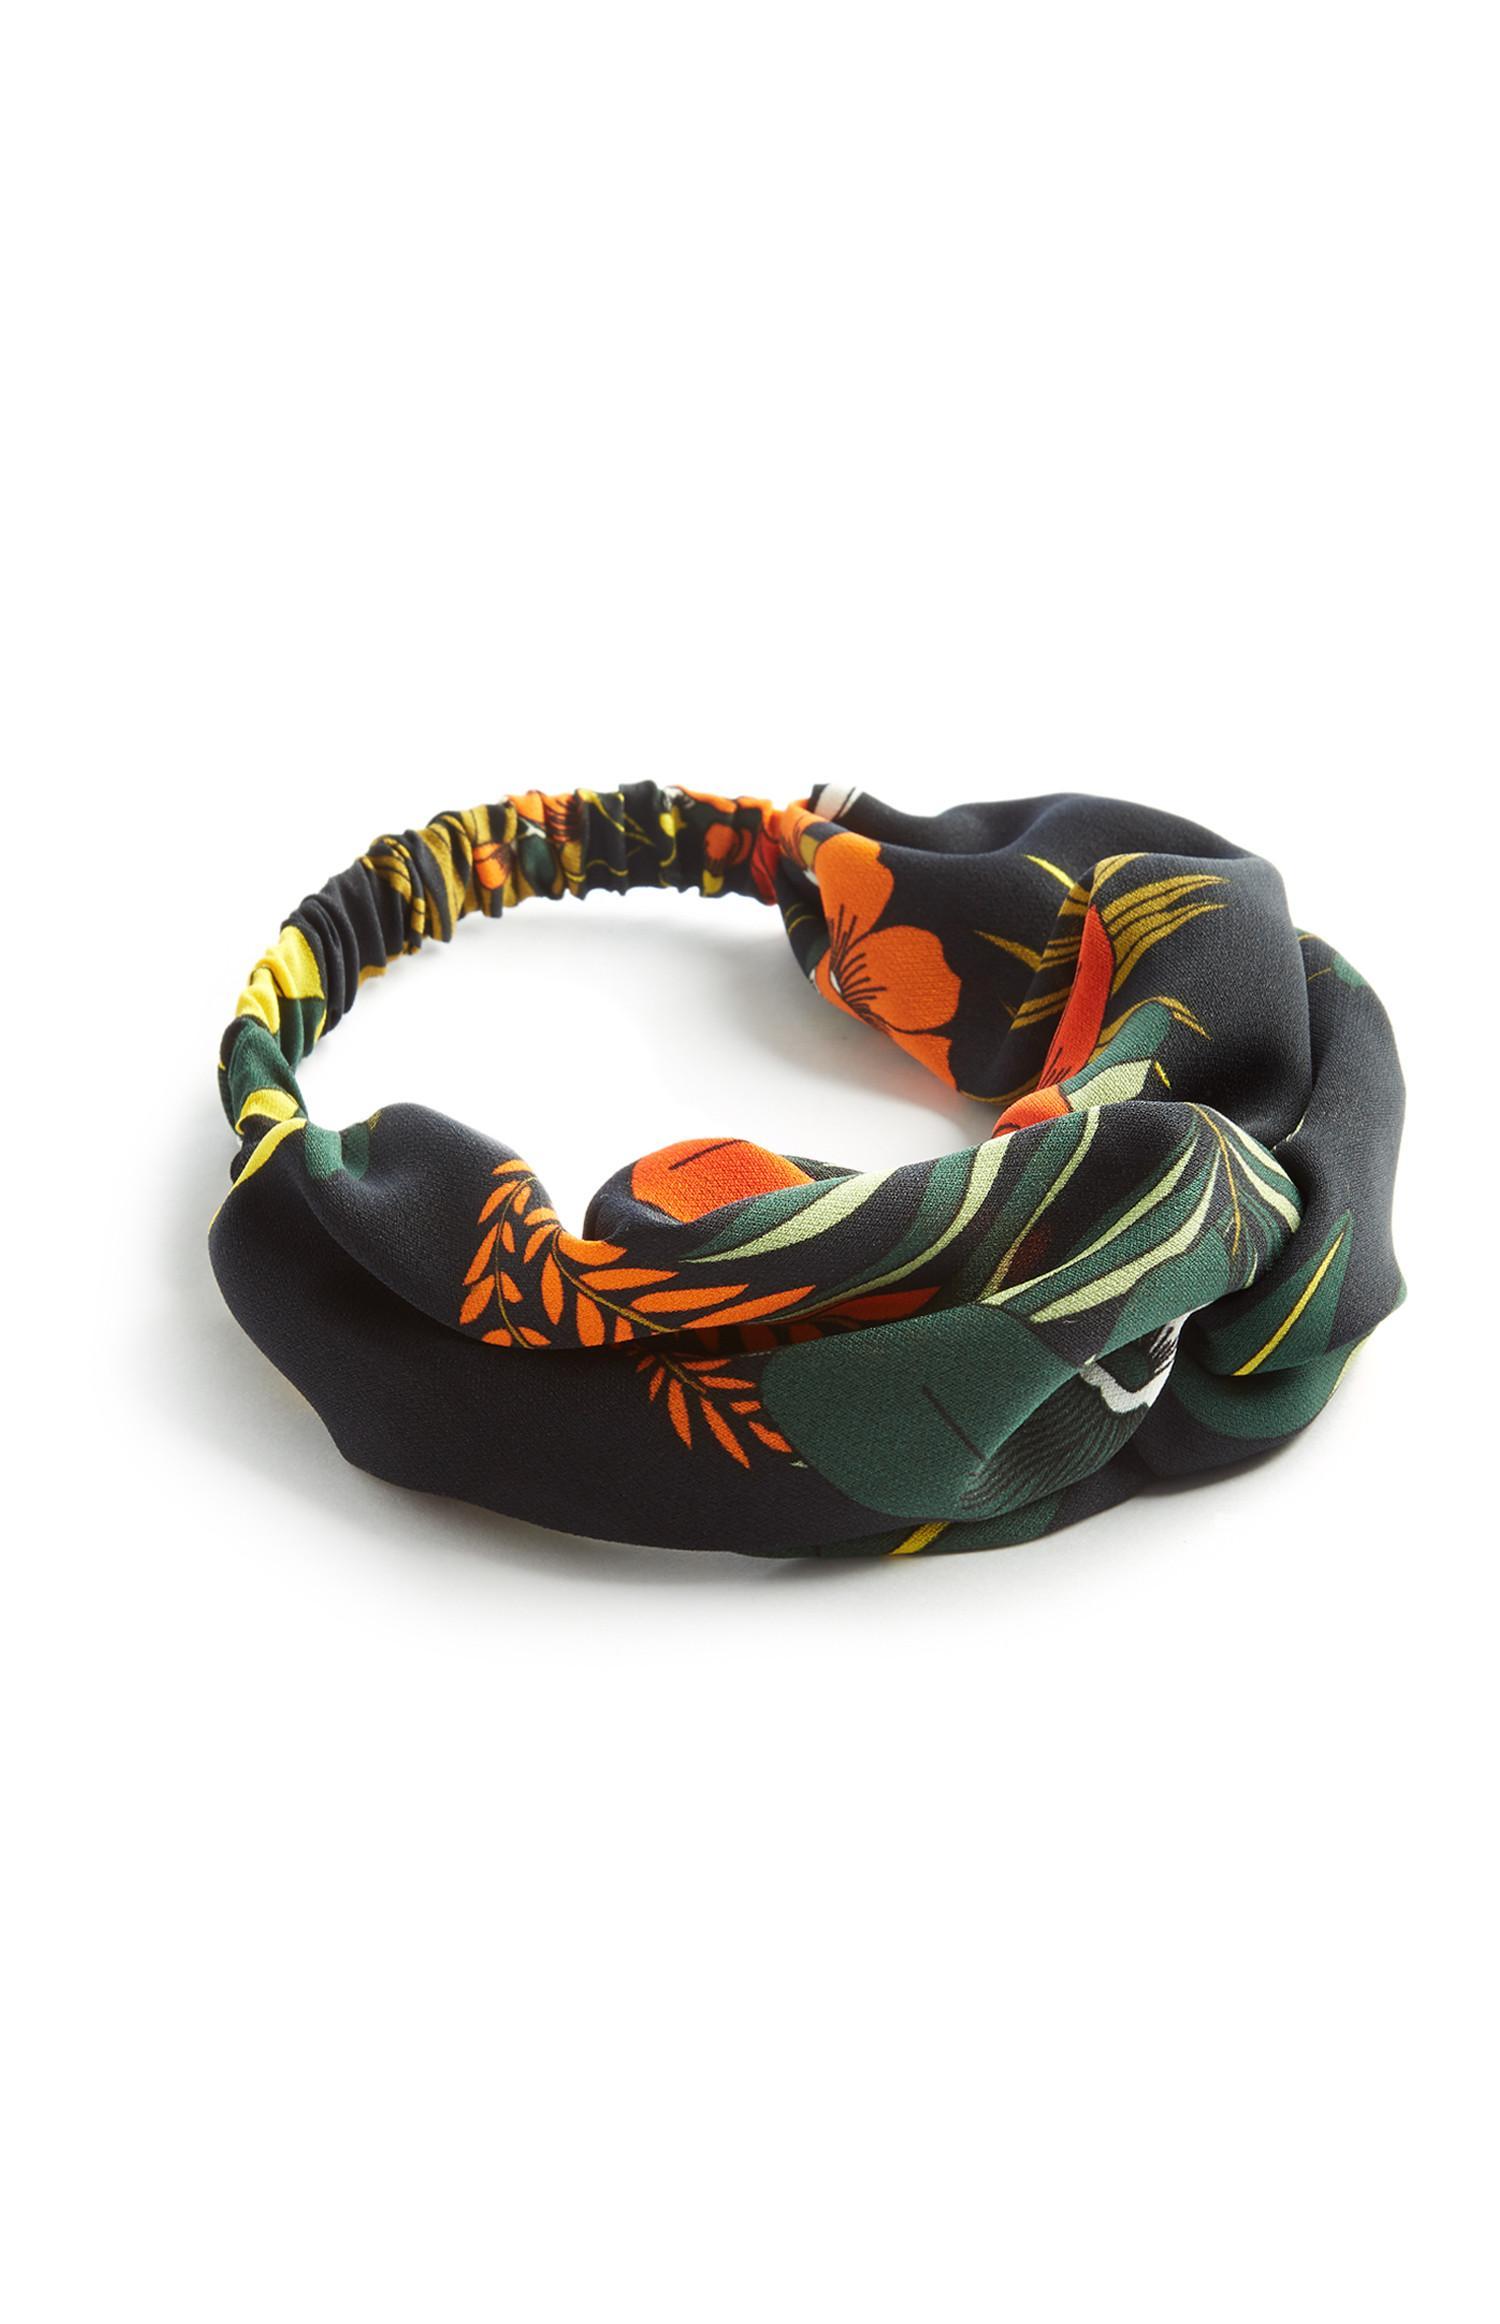 Zwarte hoofdband met bladerprint